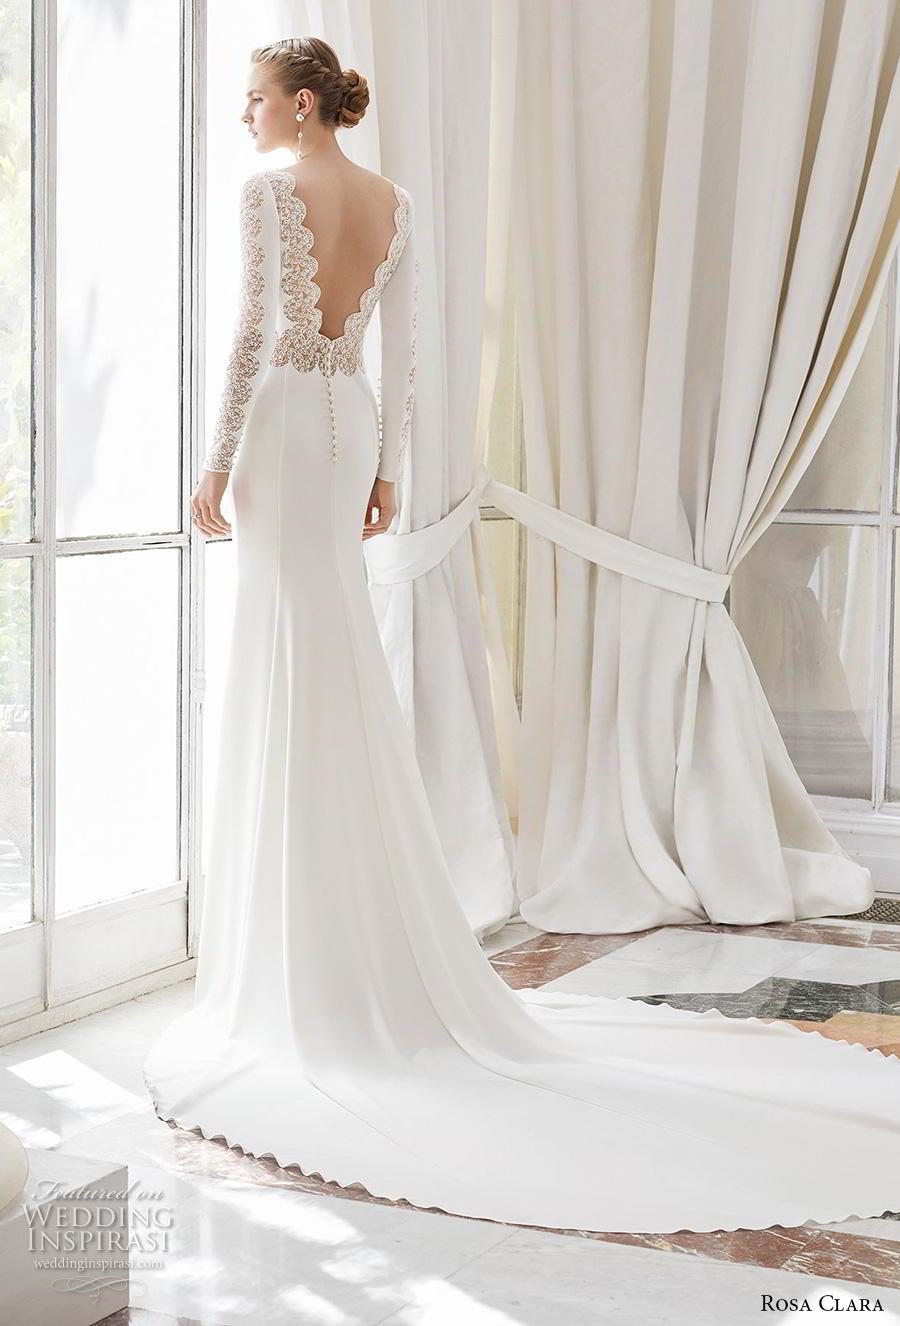 rosa clara 2019 couture bridal long sleeves bateau neckline simple minimalist elegant fit and flare sheath wedding dress v back chapel train (7) bv